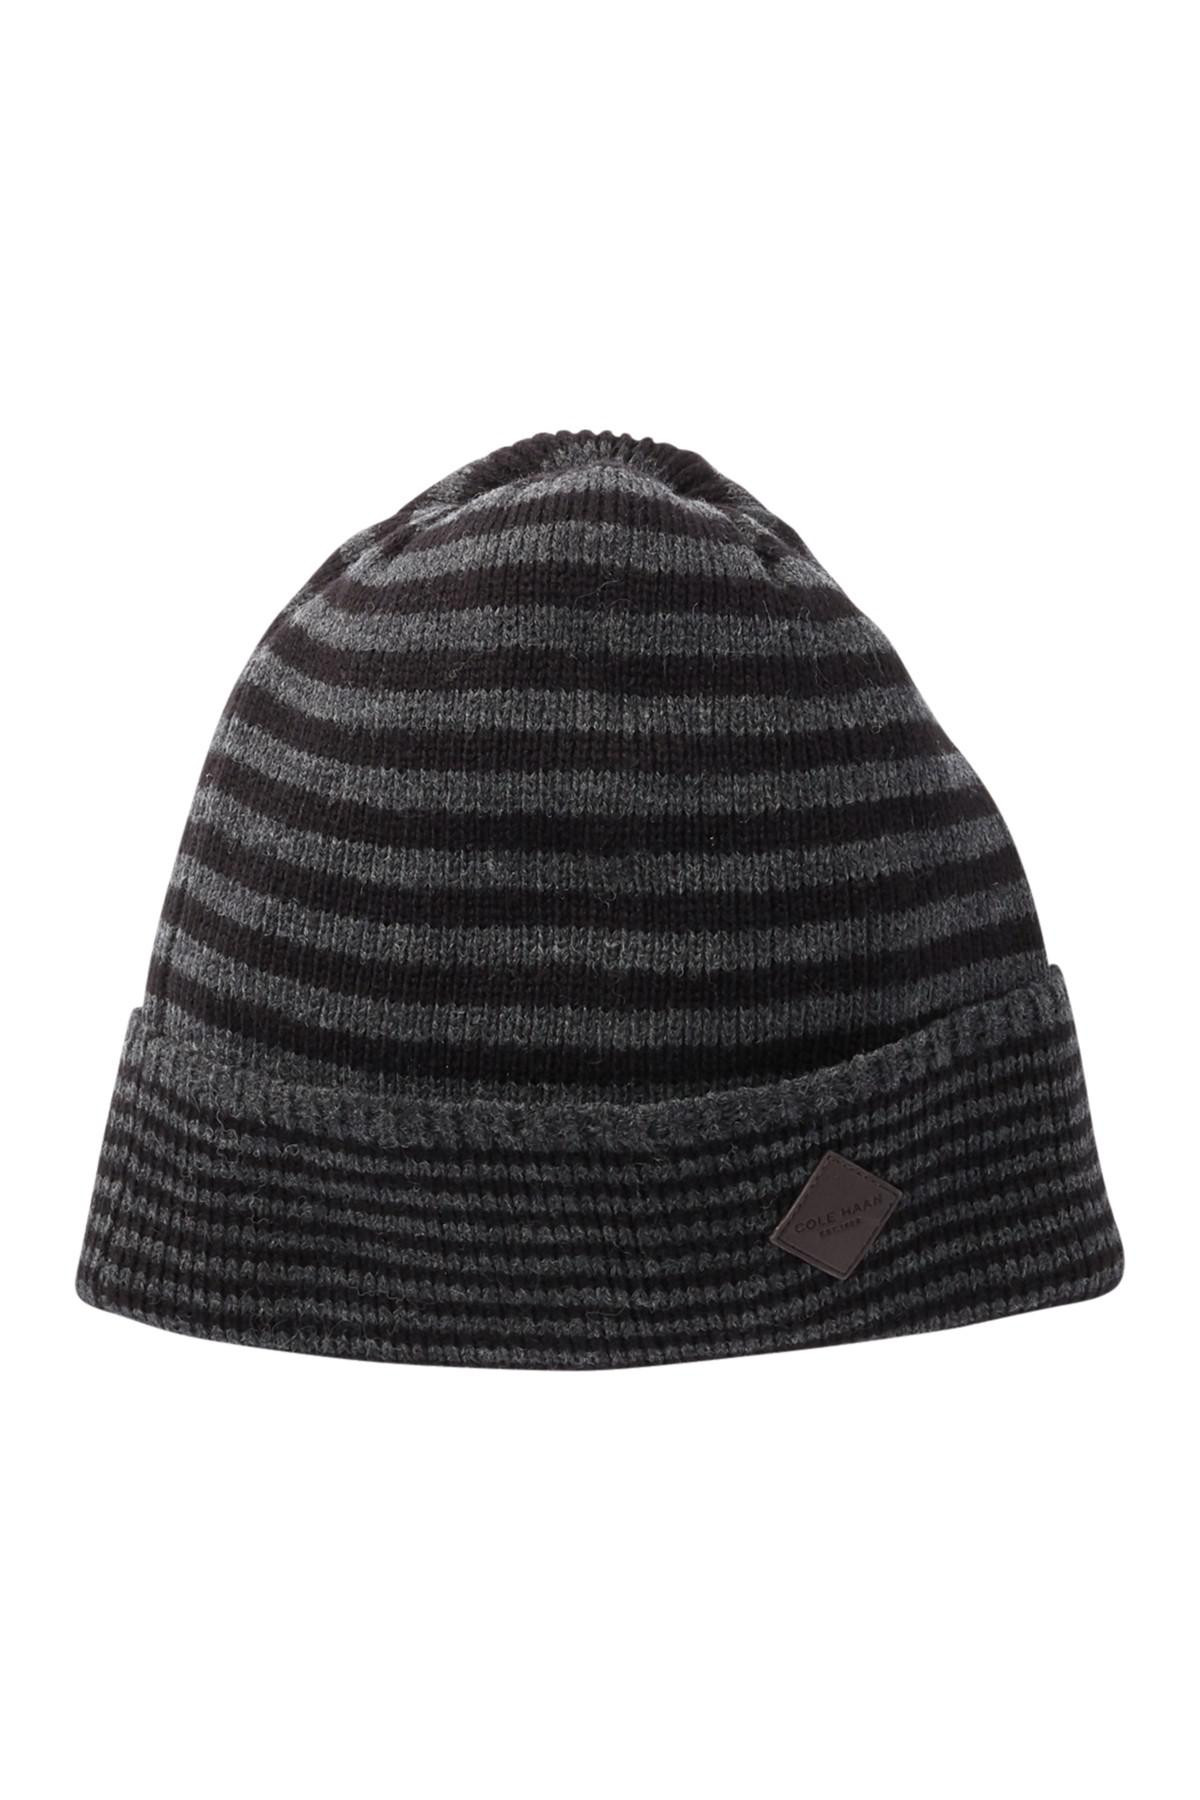 7bbd22f7aa7 Lyst - Cole Haan Double Stripe Cuff Beanie in Black for Men